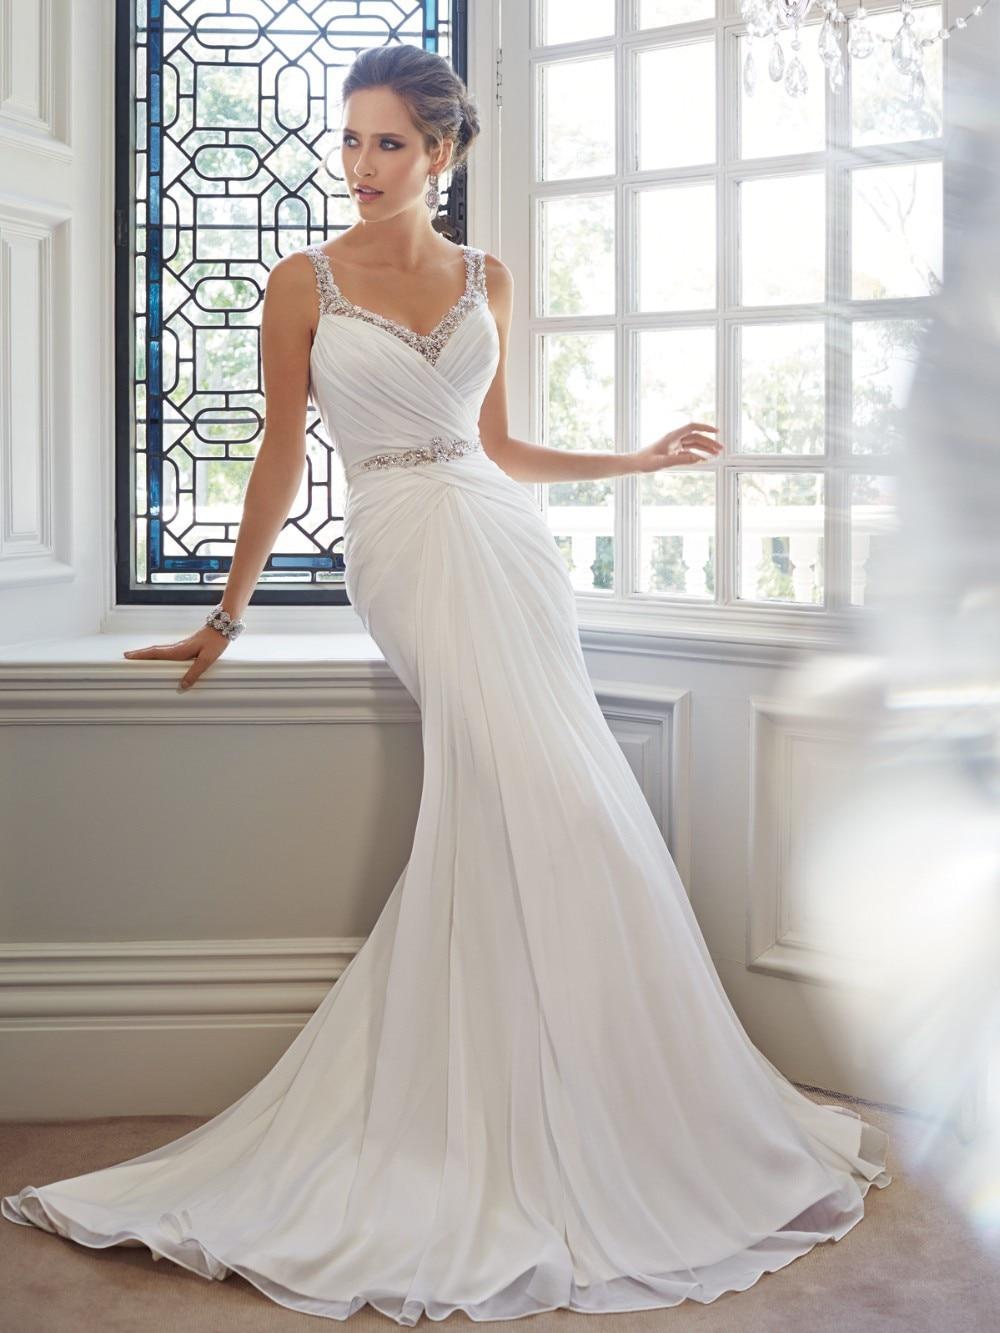 Aliexpress.com : Buy Mermaid White Chiffon Sexy Backless Wedding ...